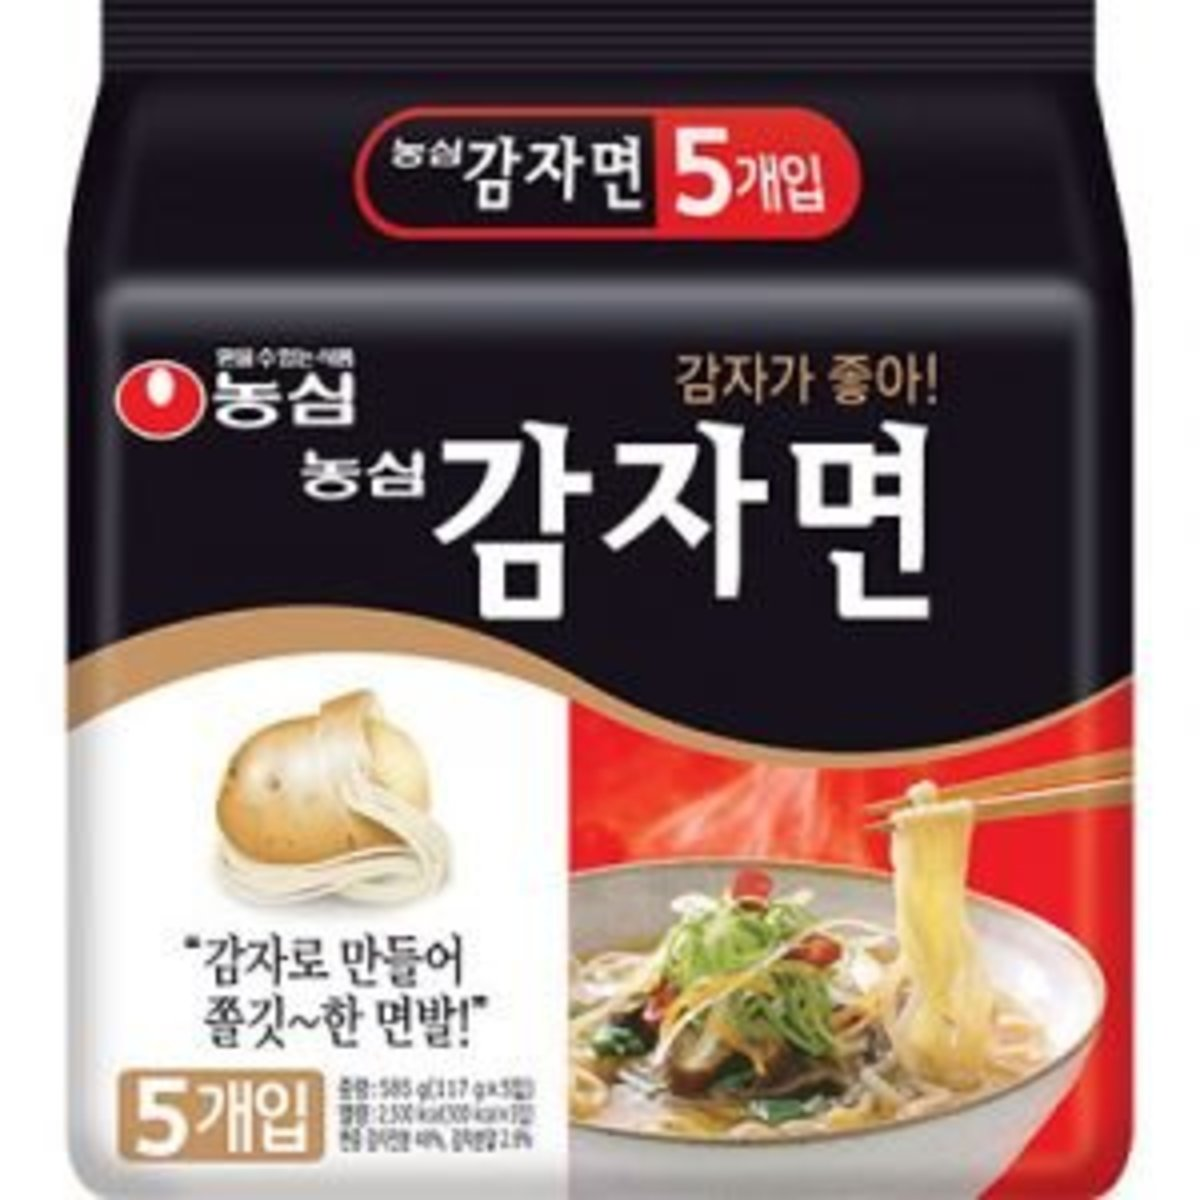 Spicy Potato Noodle 5 pack (8801043029643)